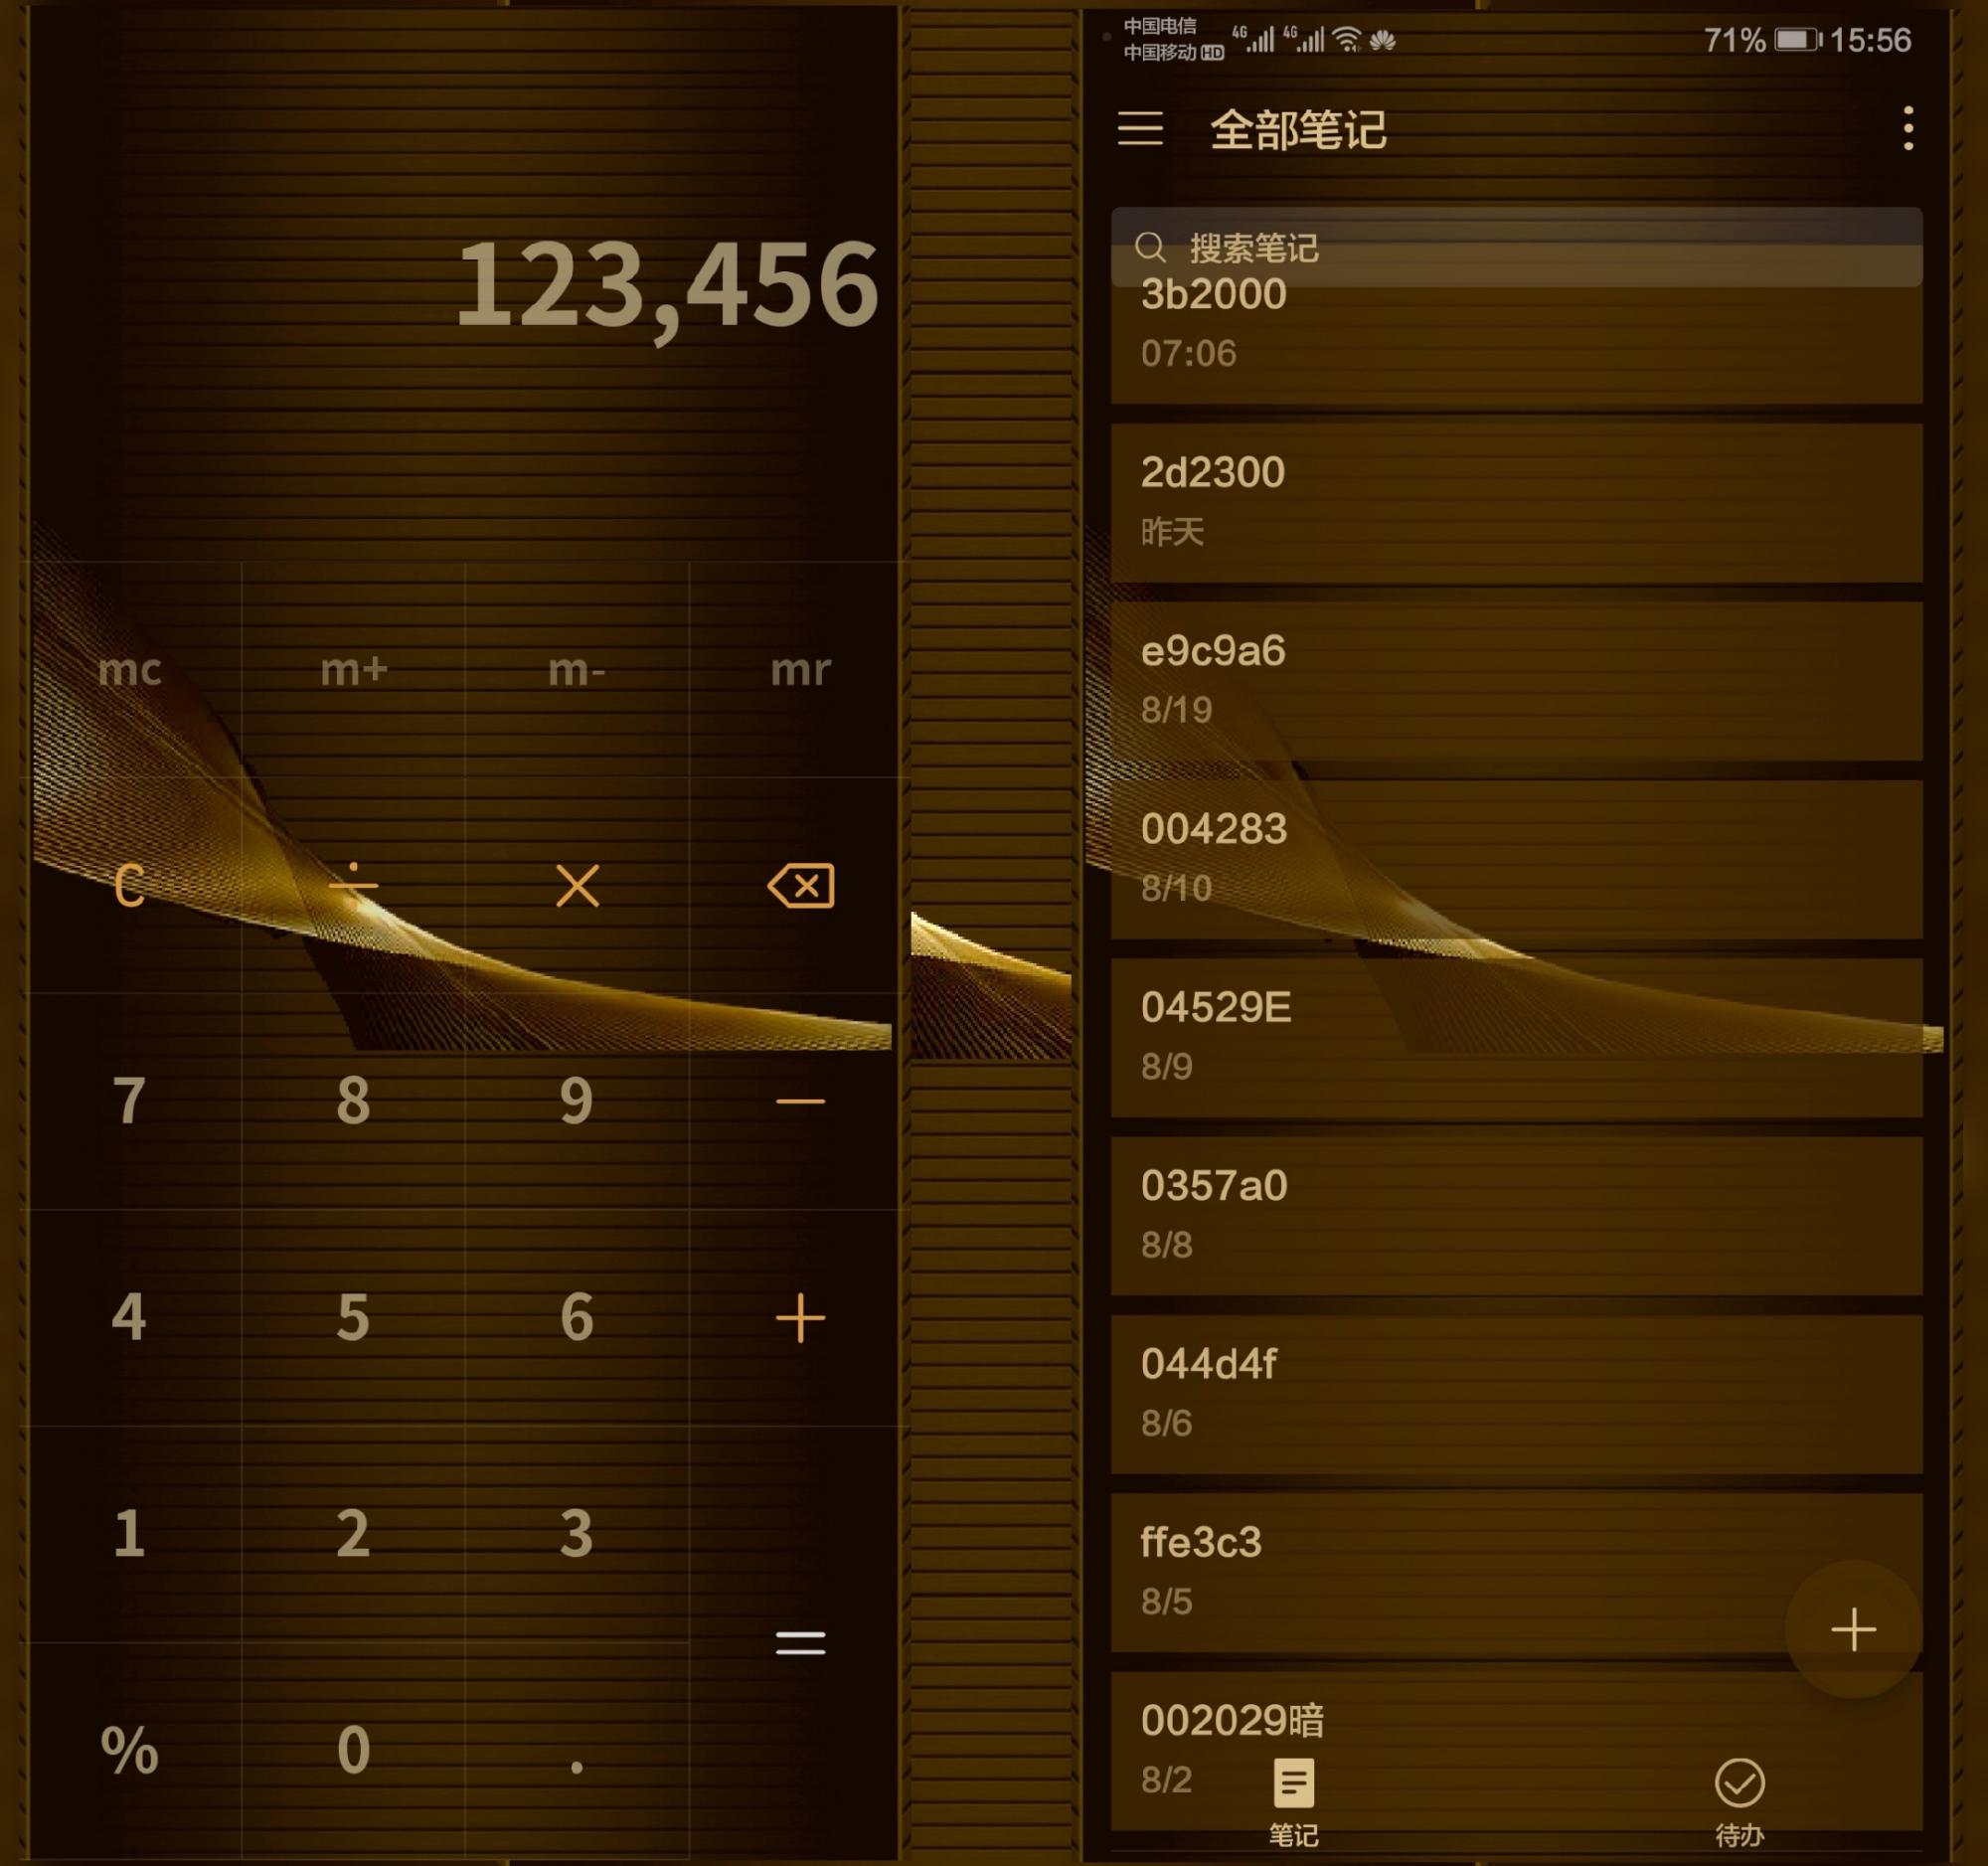 background_emui.9_1566364717566_1566377788746_1566378911900.jpg